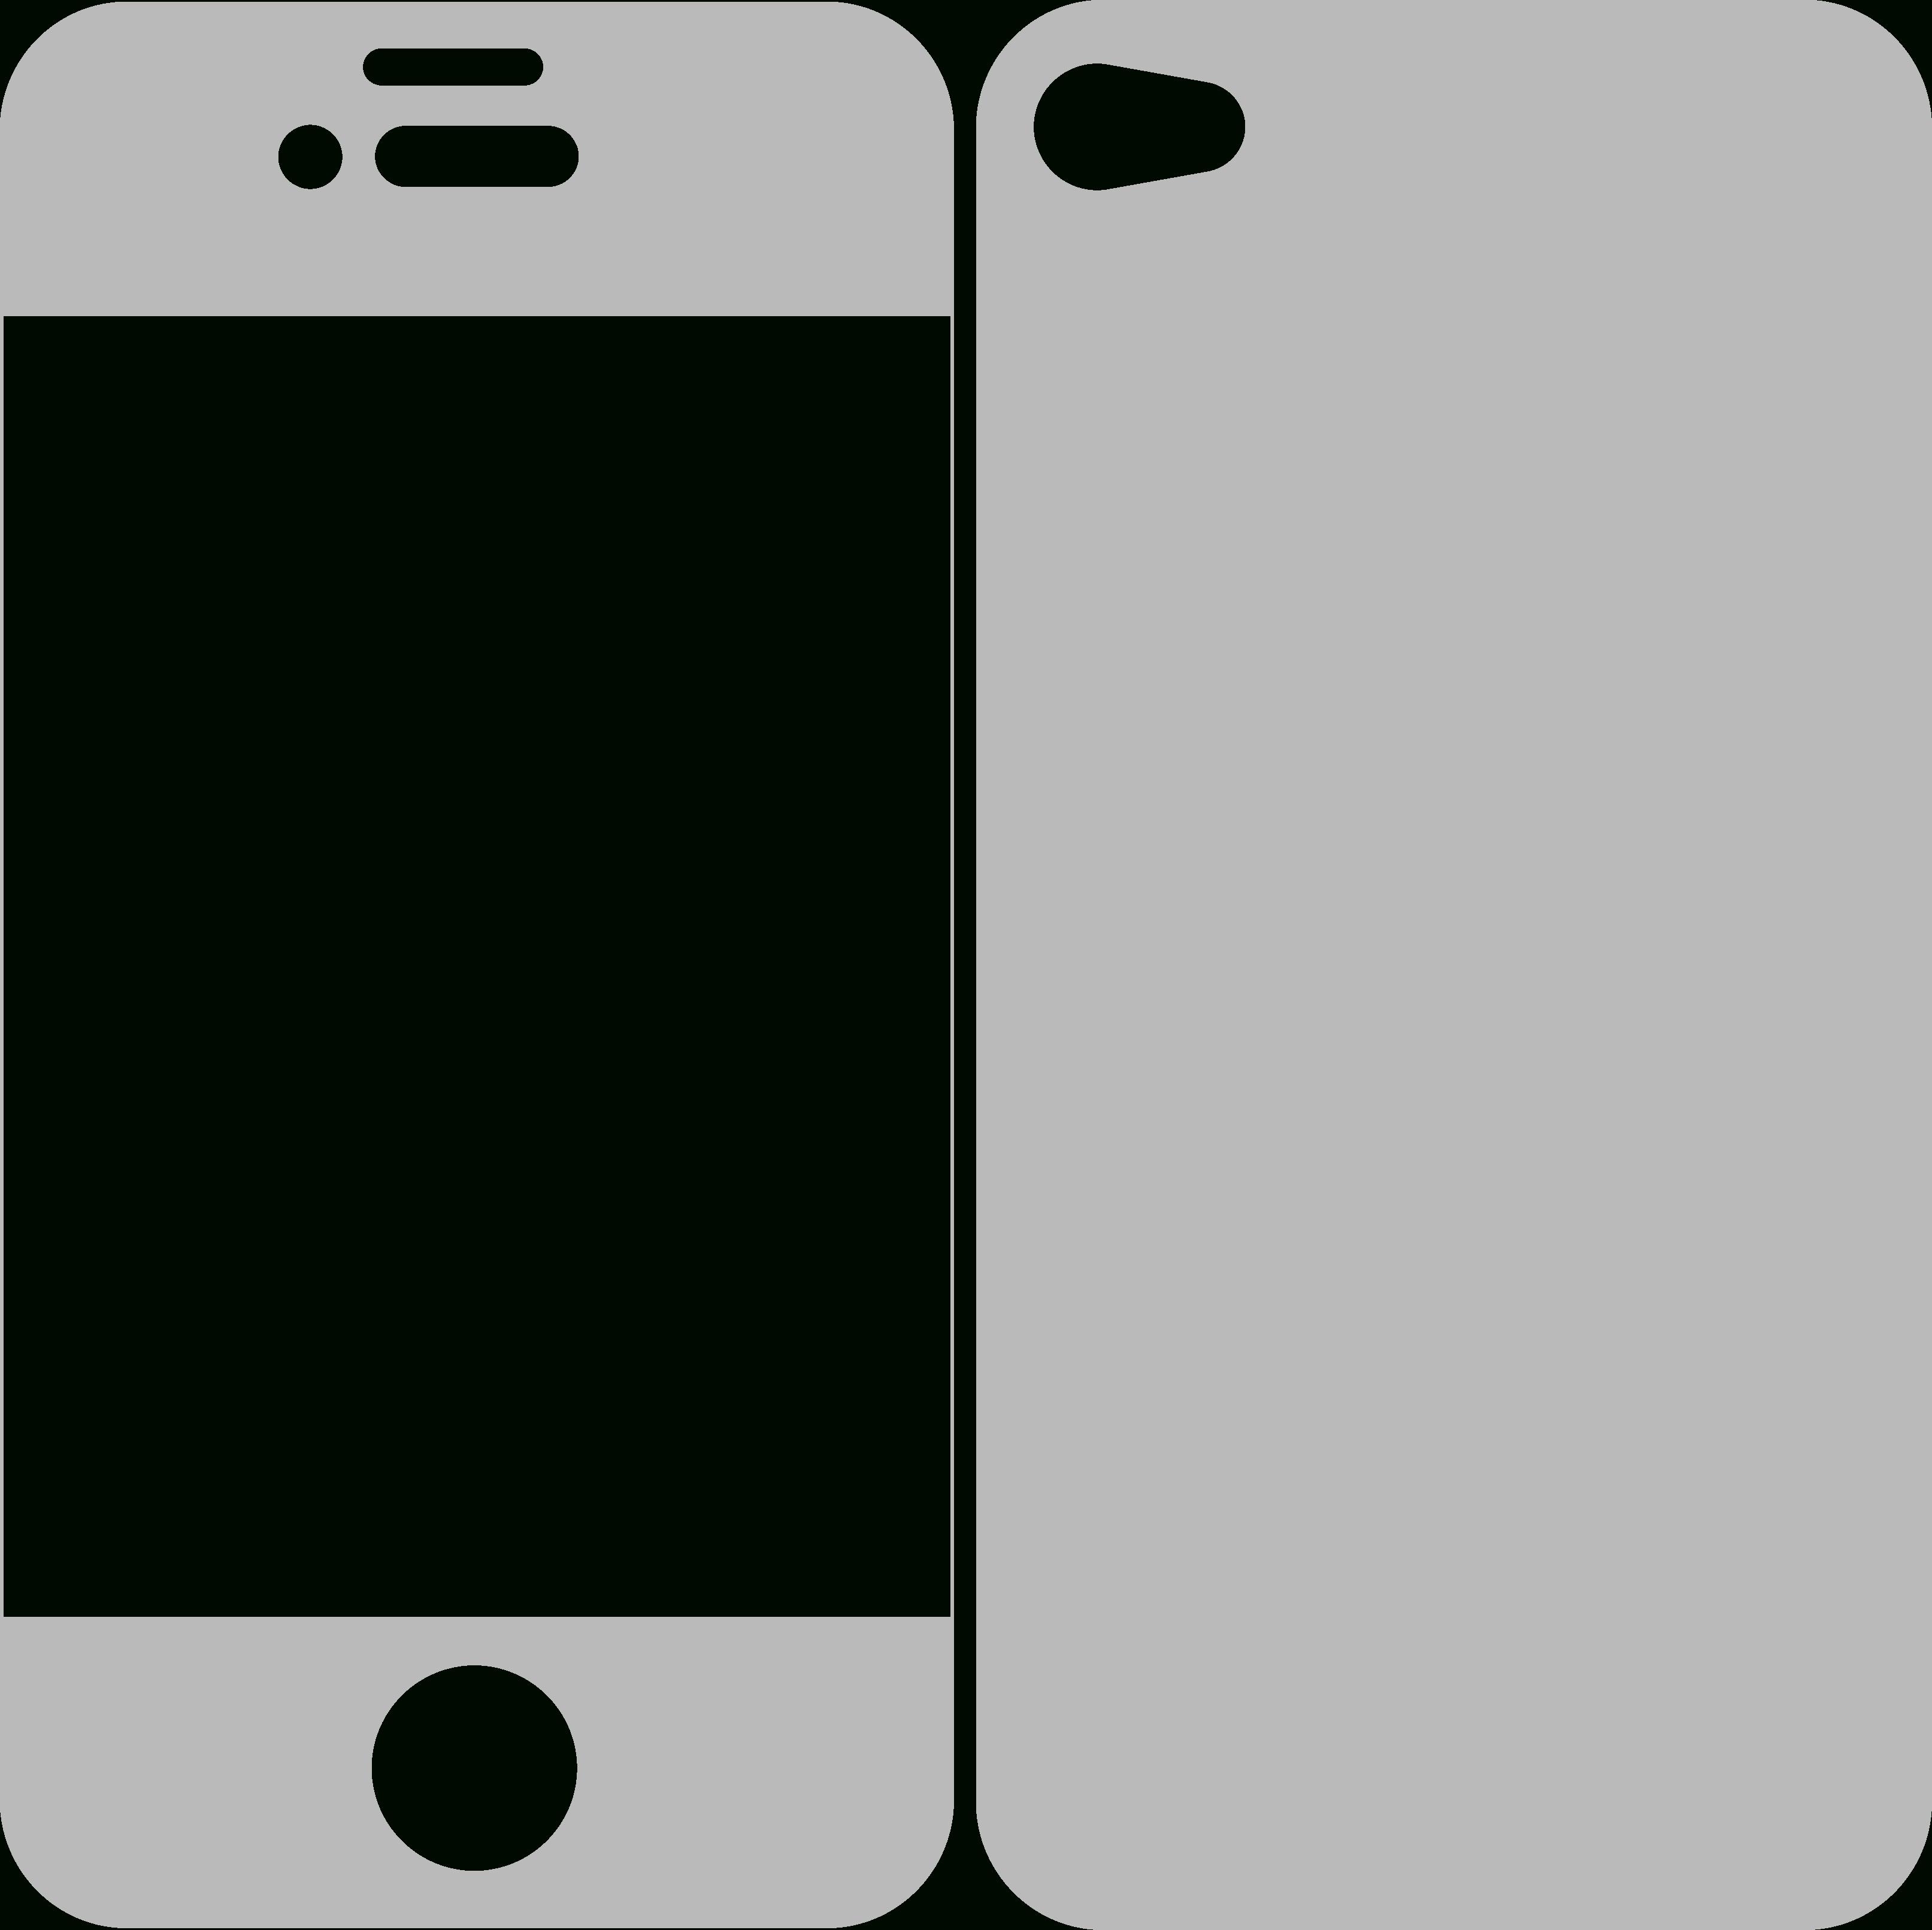 Free Iphone 6 Skin Template - Free Printable Iphone Skins | Free - Free Printable Iphone Skins